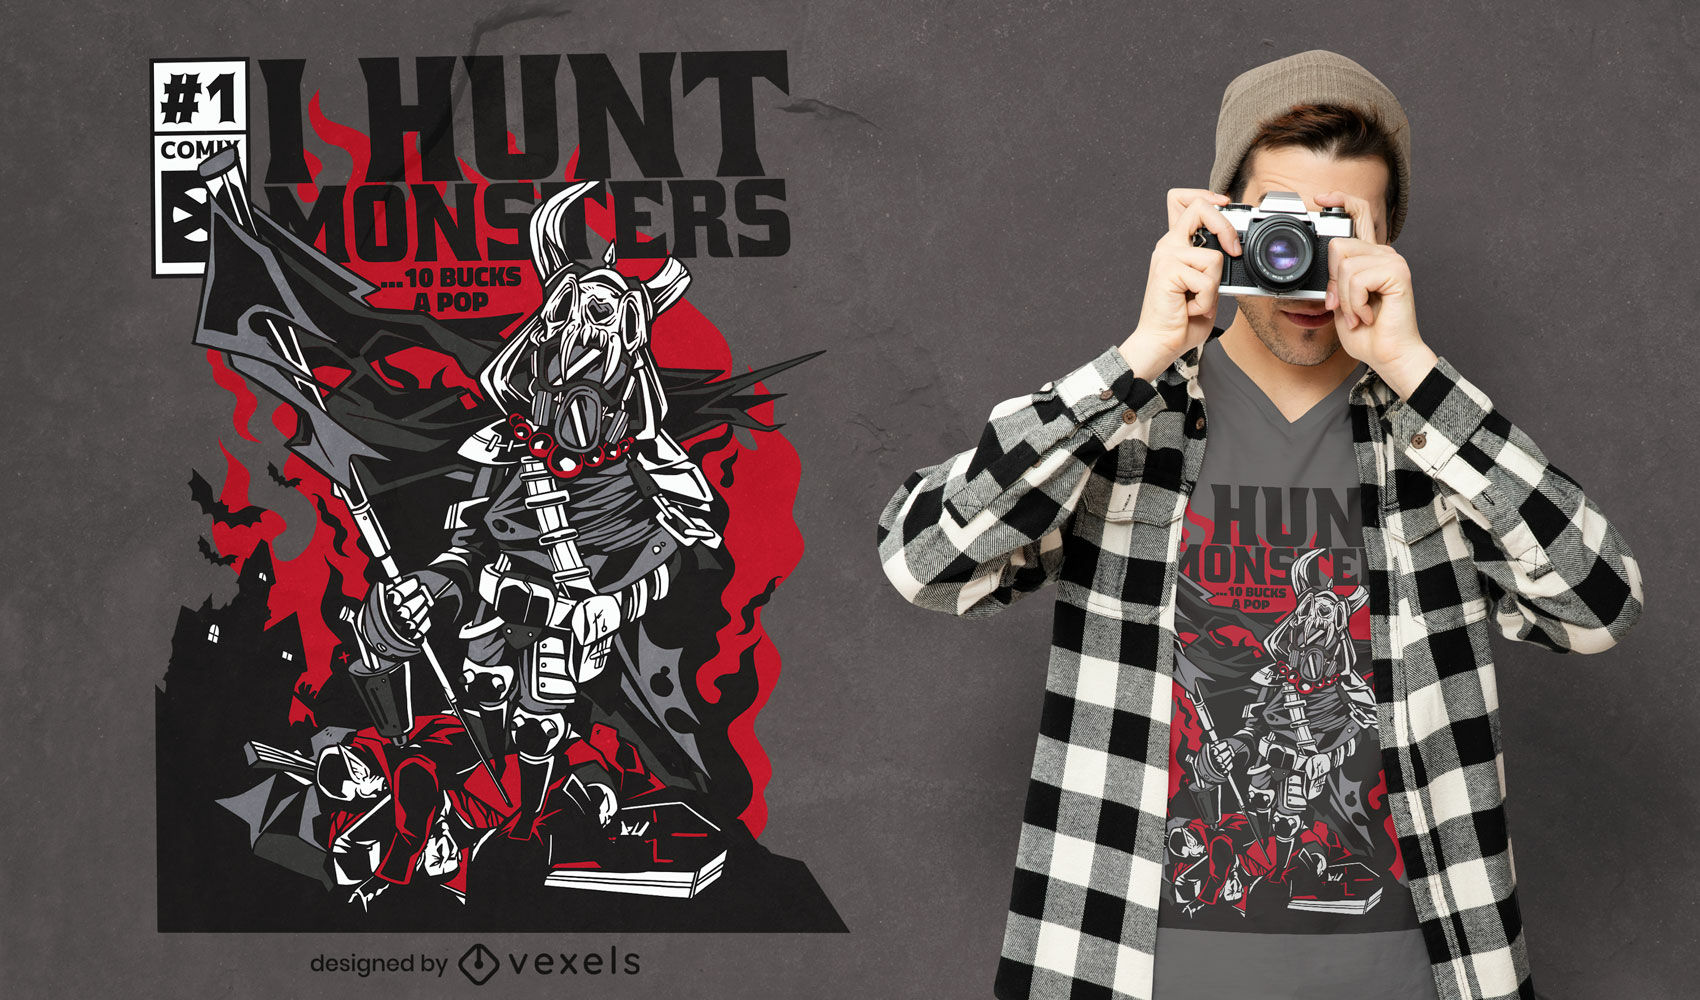 Monster hunter warrior comic book cover t-shirt design